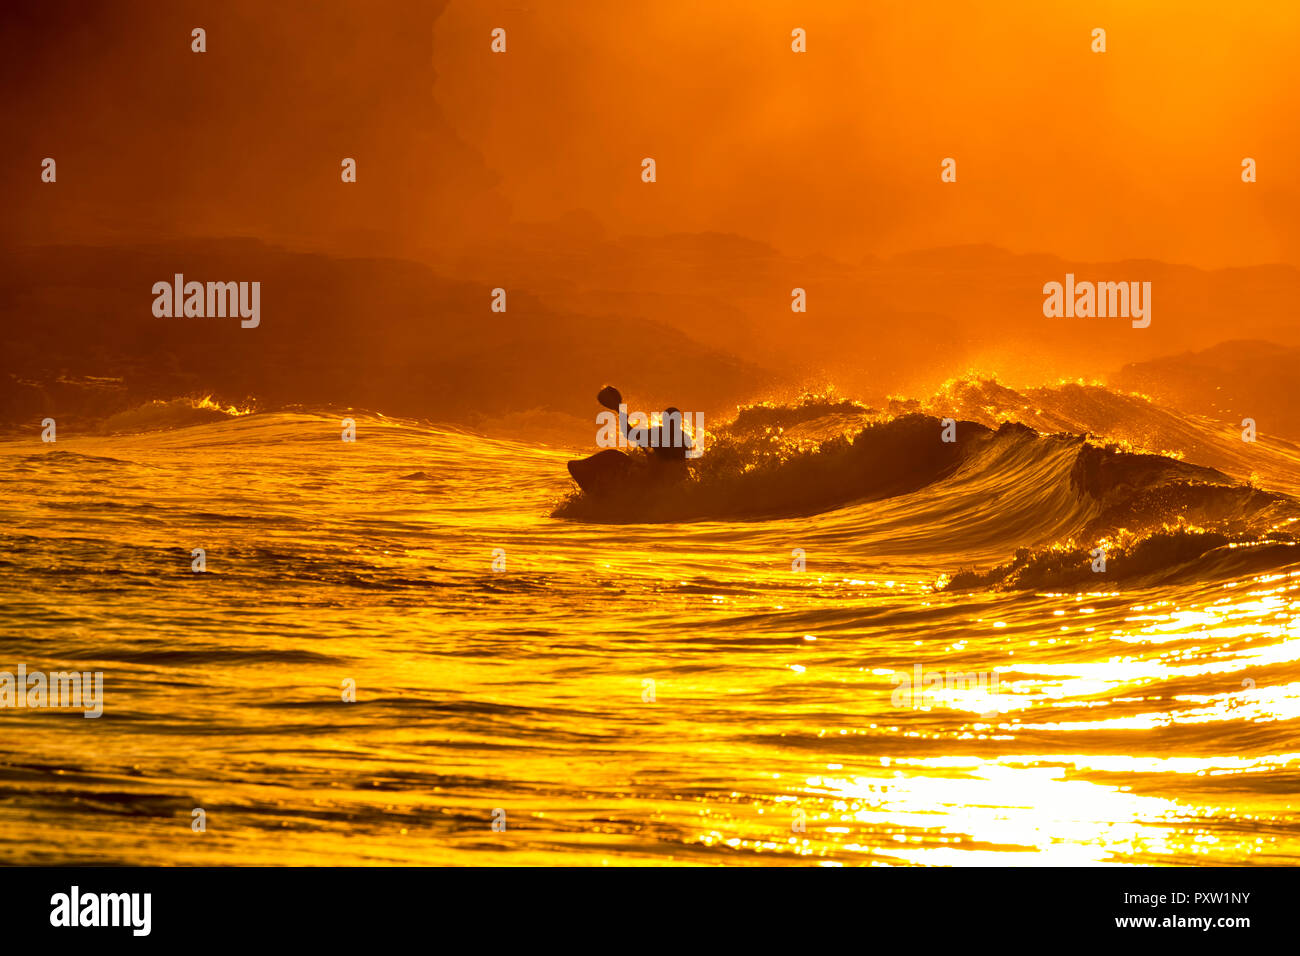 UK, Scotland, East Lothian, Water Sport, Kayak Surfing, sunset - Stock Image